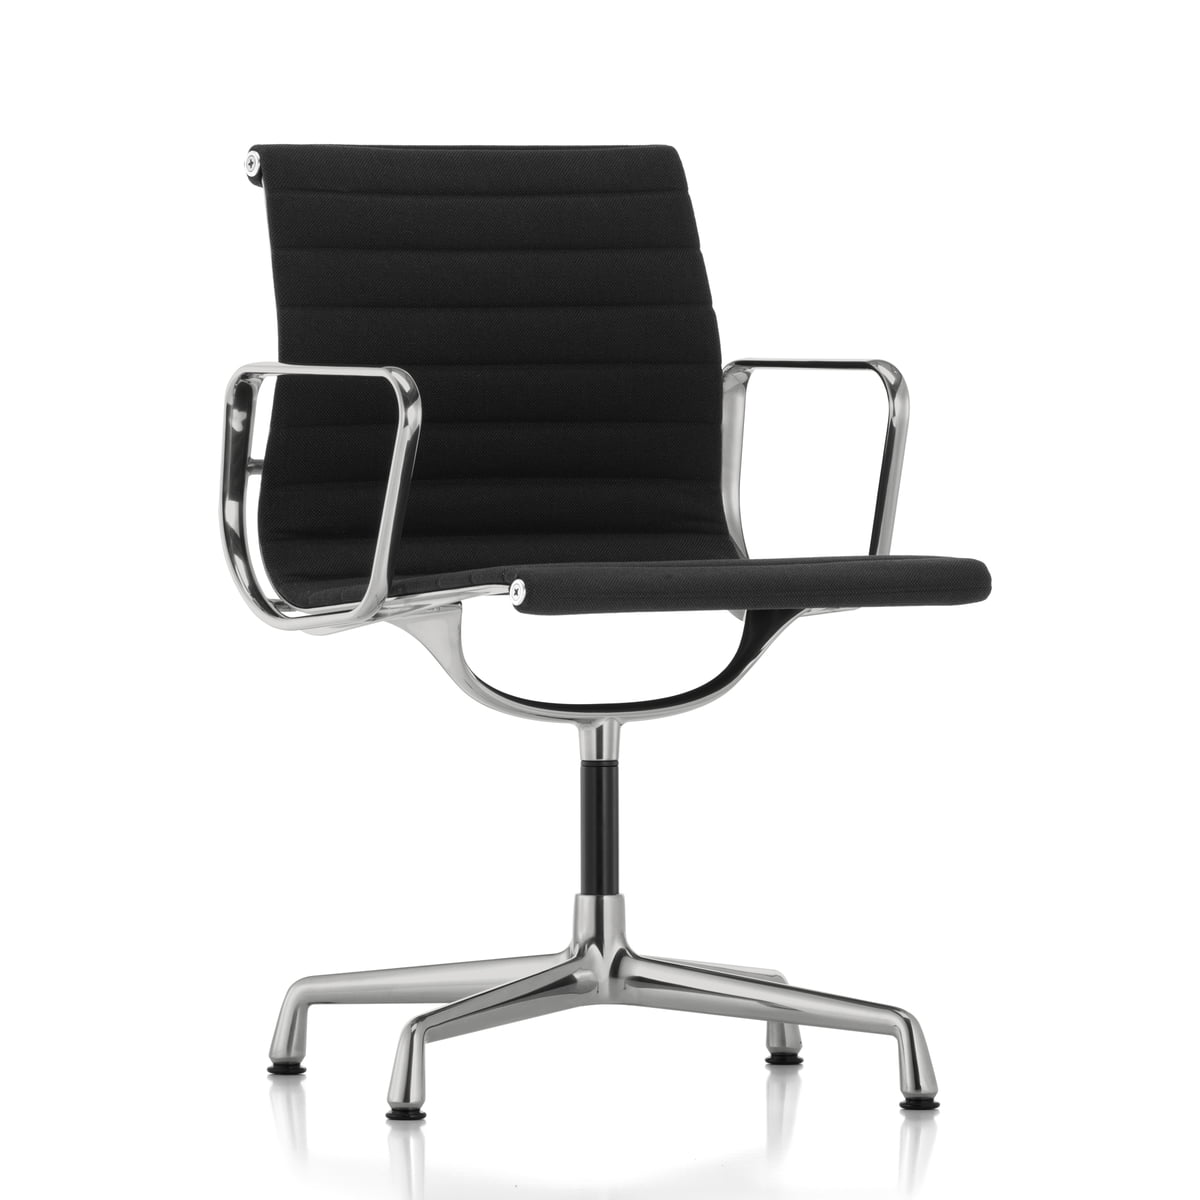 aluminium group ea 104 drehstuhl von vitra. Black Bedroom Furniture Sets. Home Design Ideas